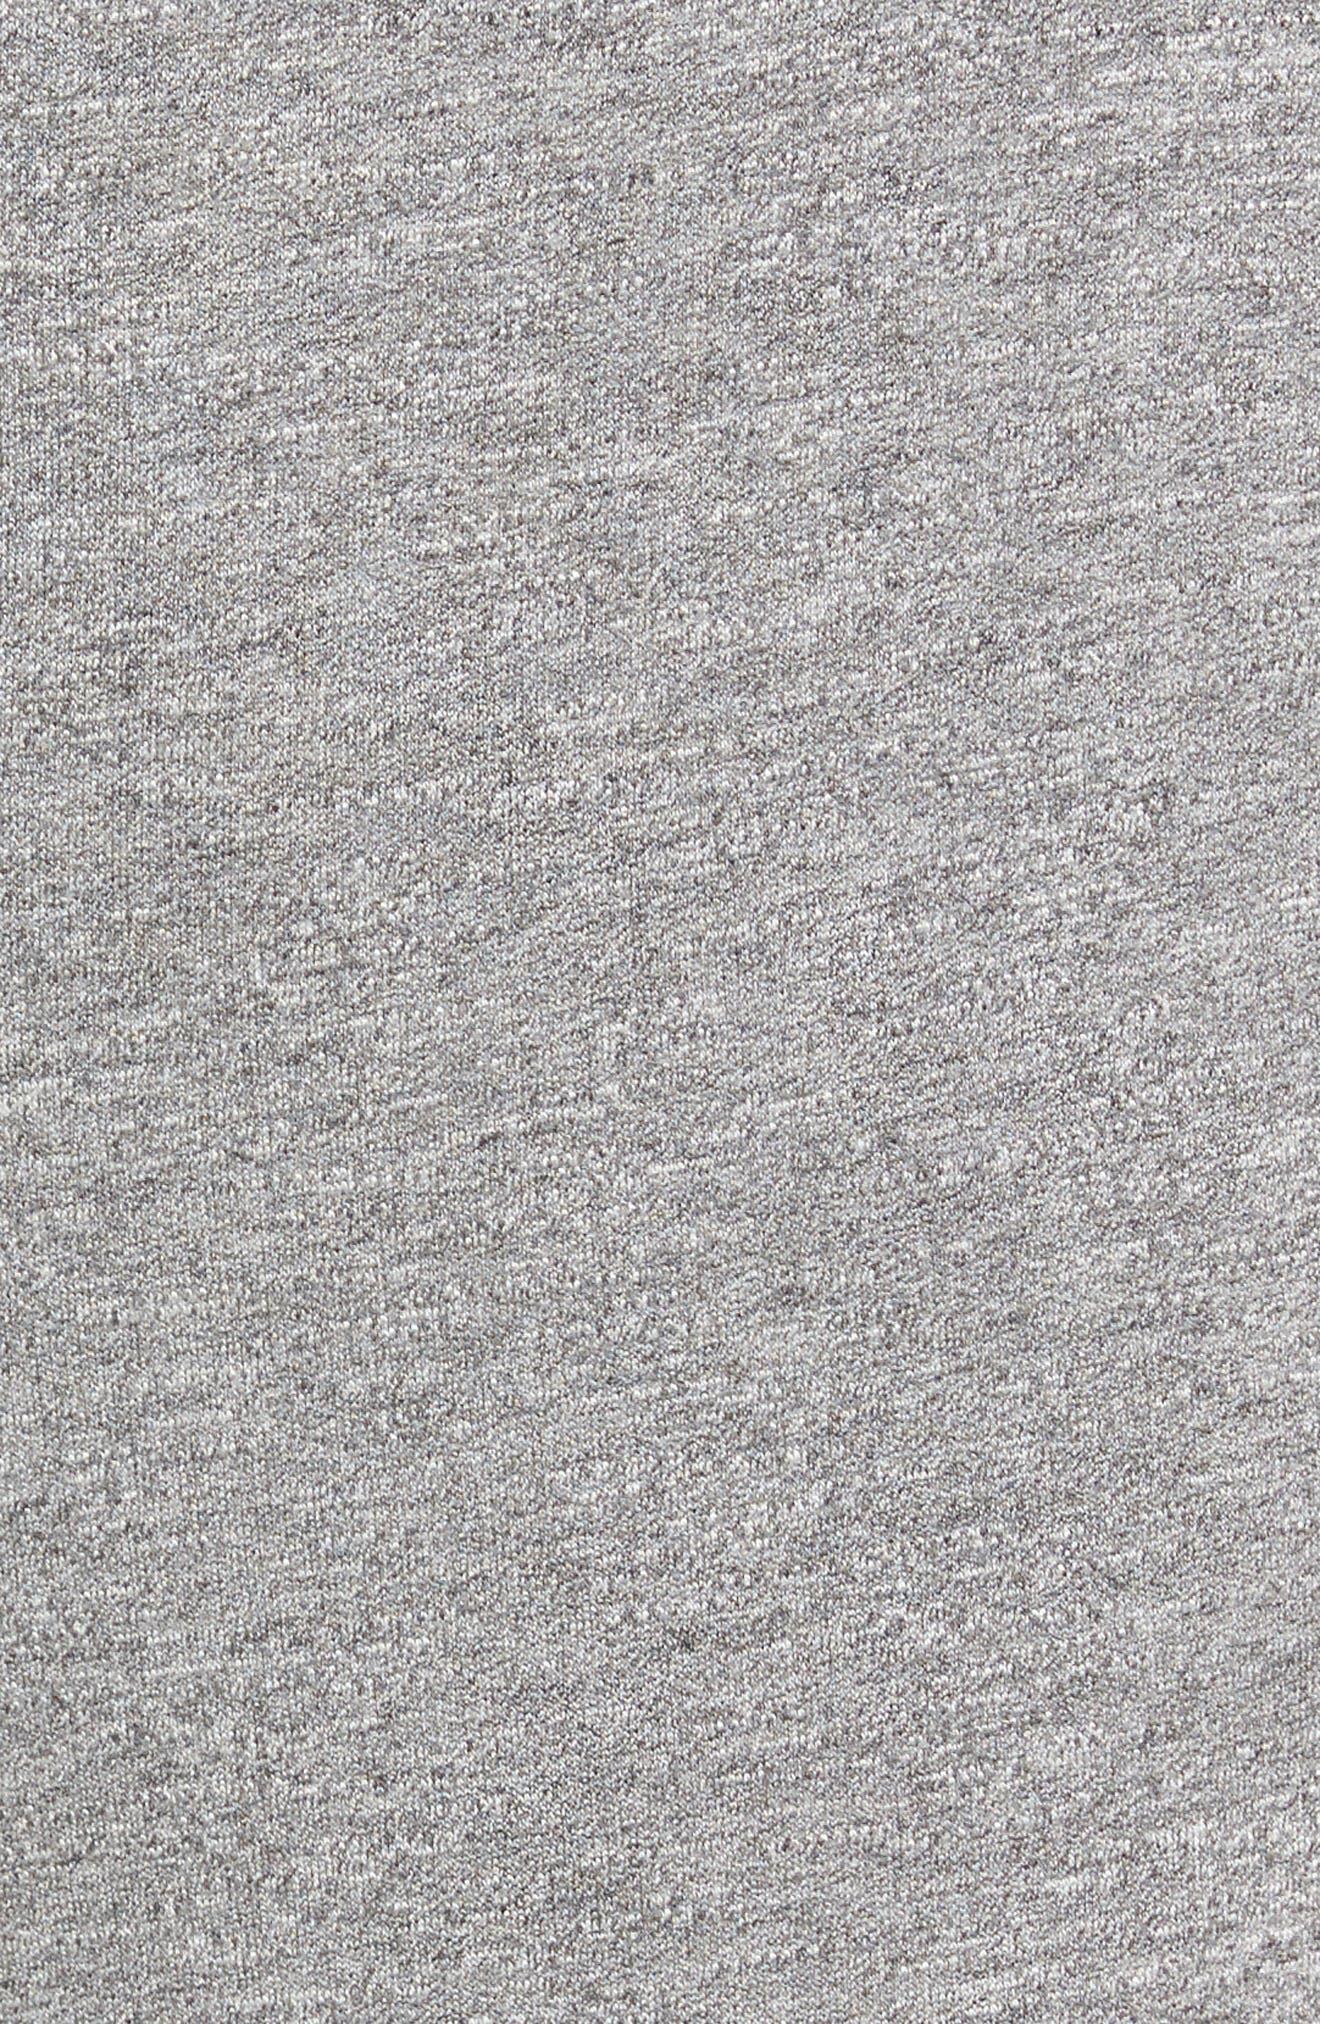 Fleece Sweatpants,                             Alternate thumbnail 5, color,                             030